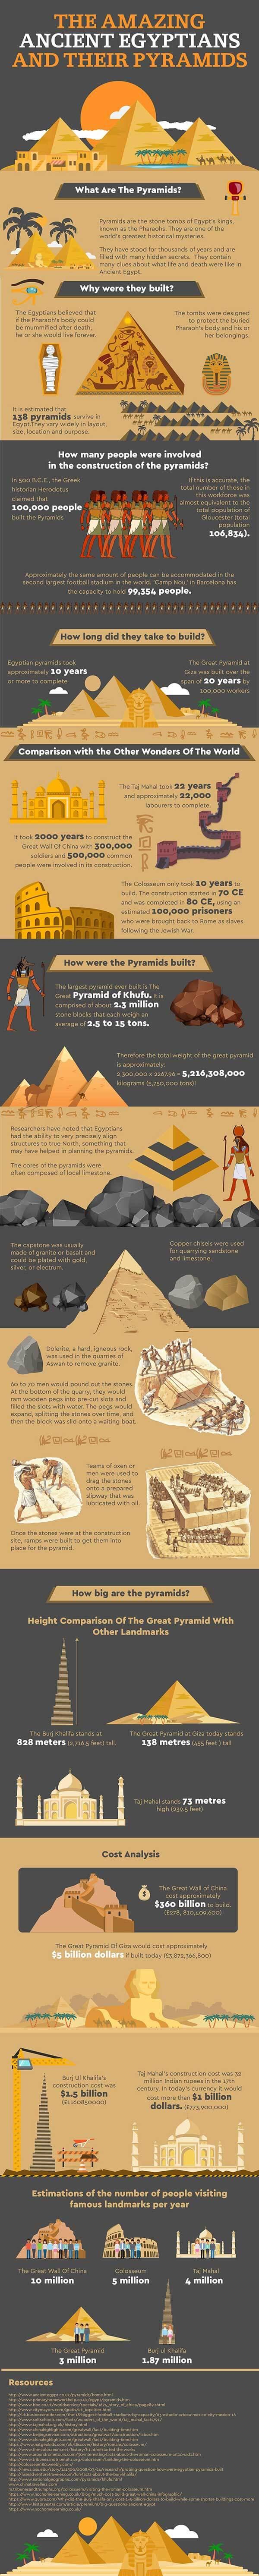 Amazing Ancient Eqyptians & Their Pyramids